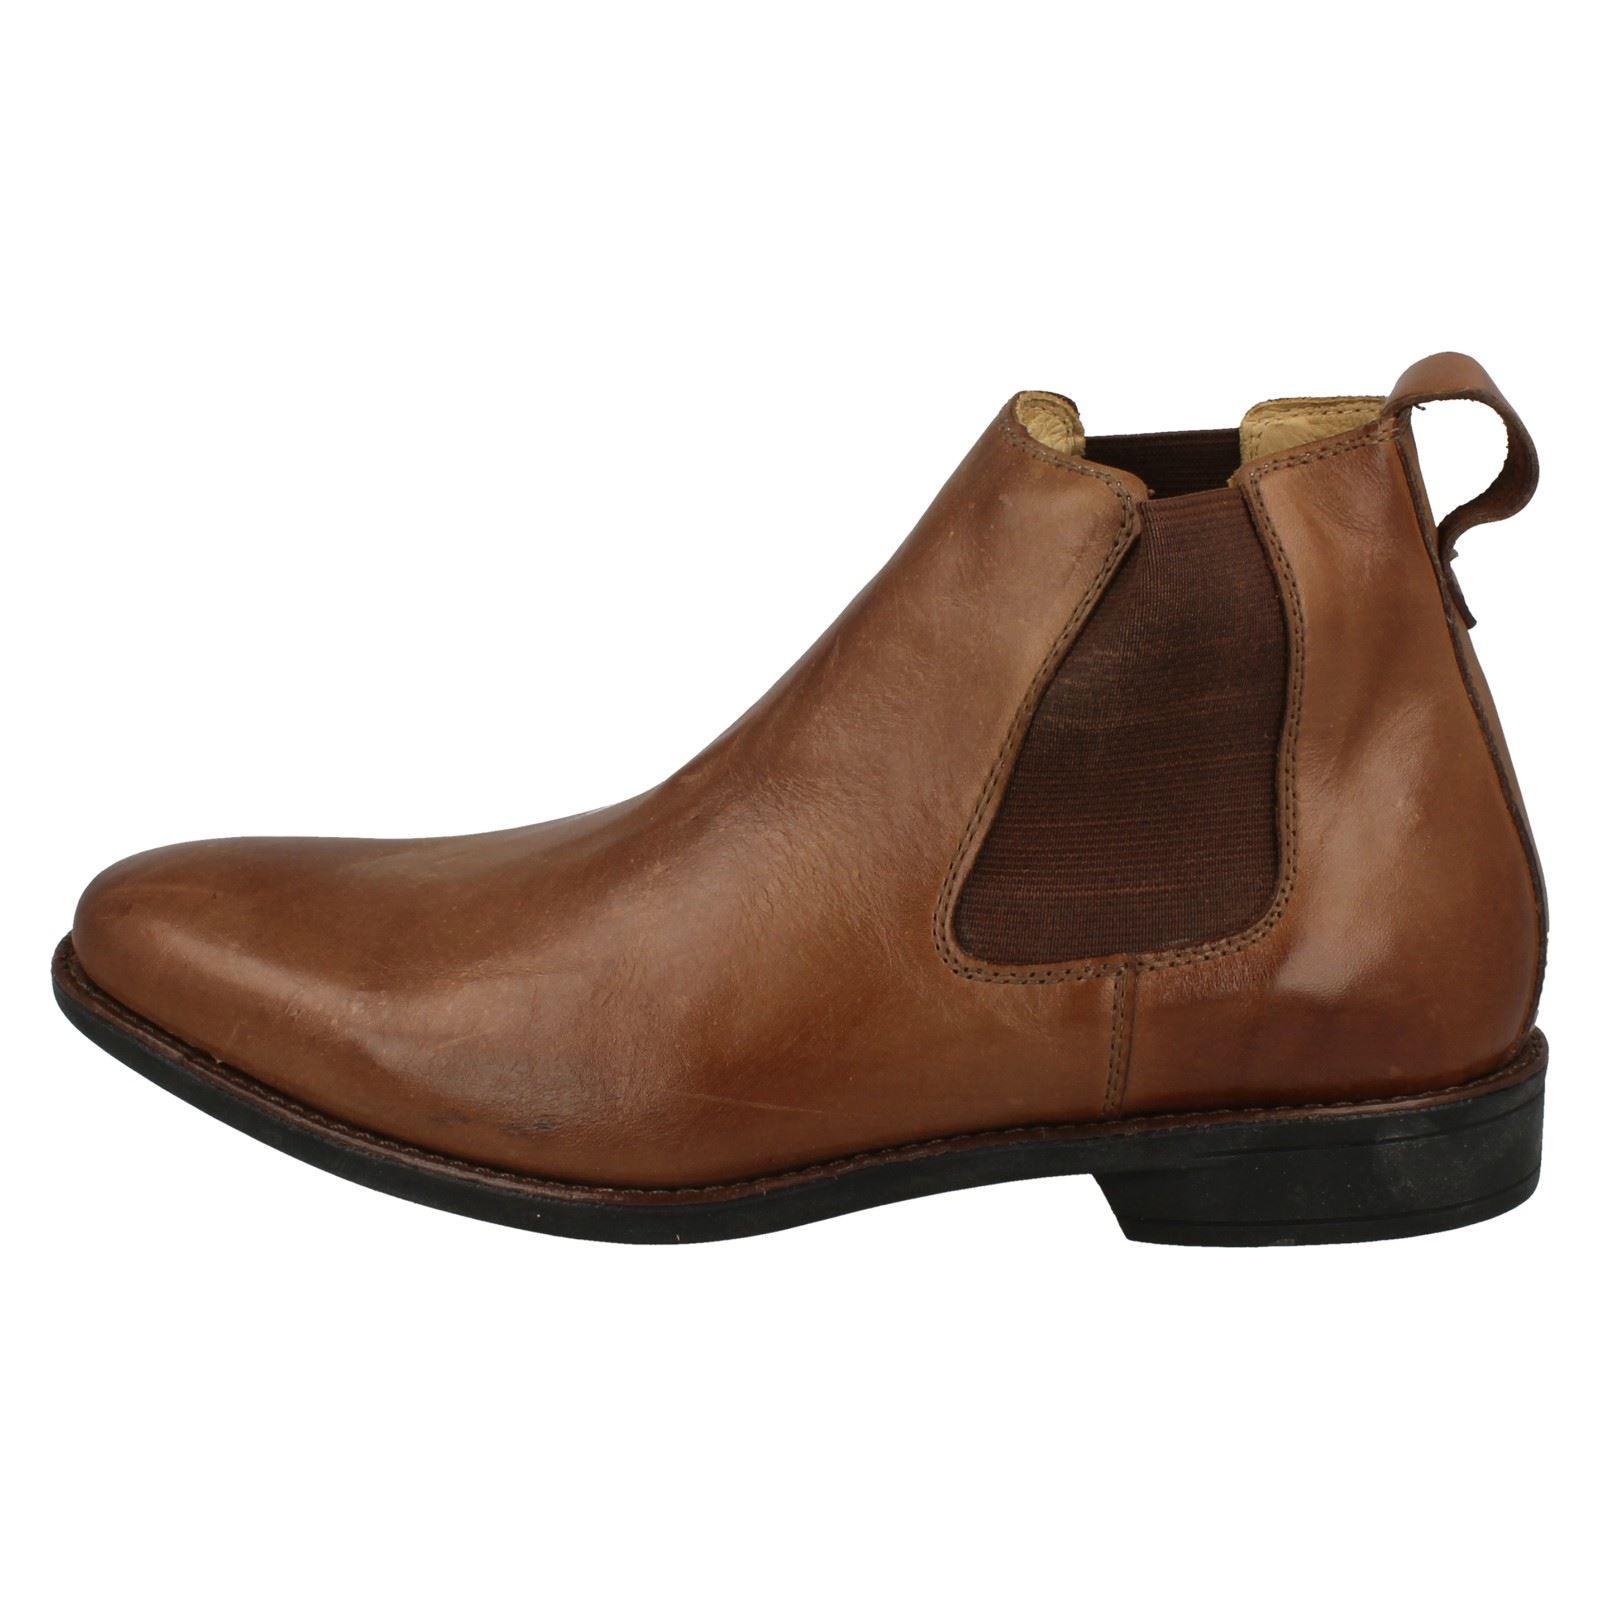 Mens-Anatomic-Chelsea-Boots-039-929211LB-039 thumbnail 19